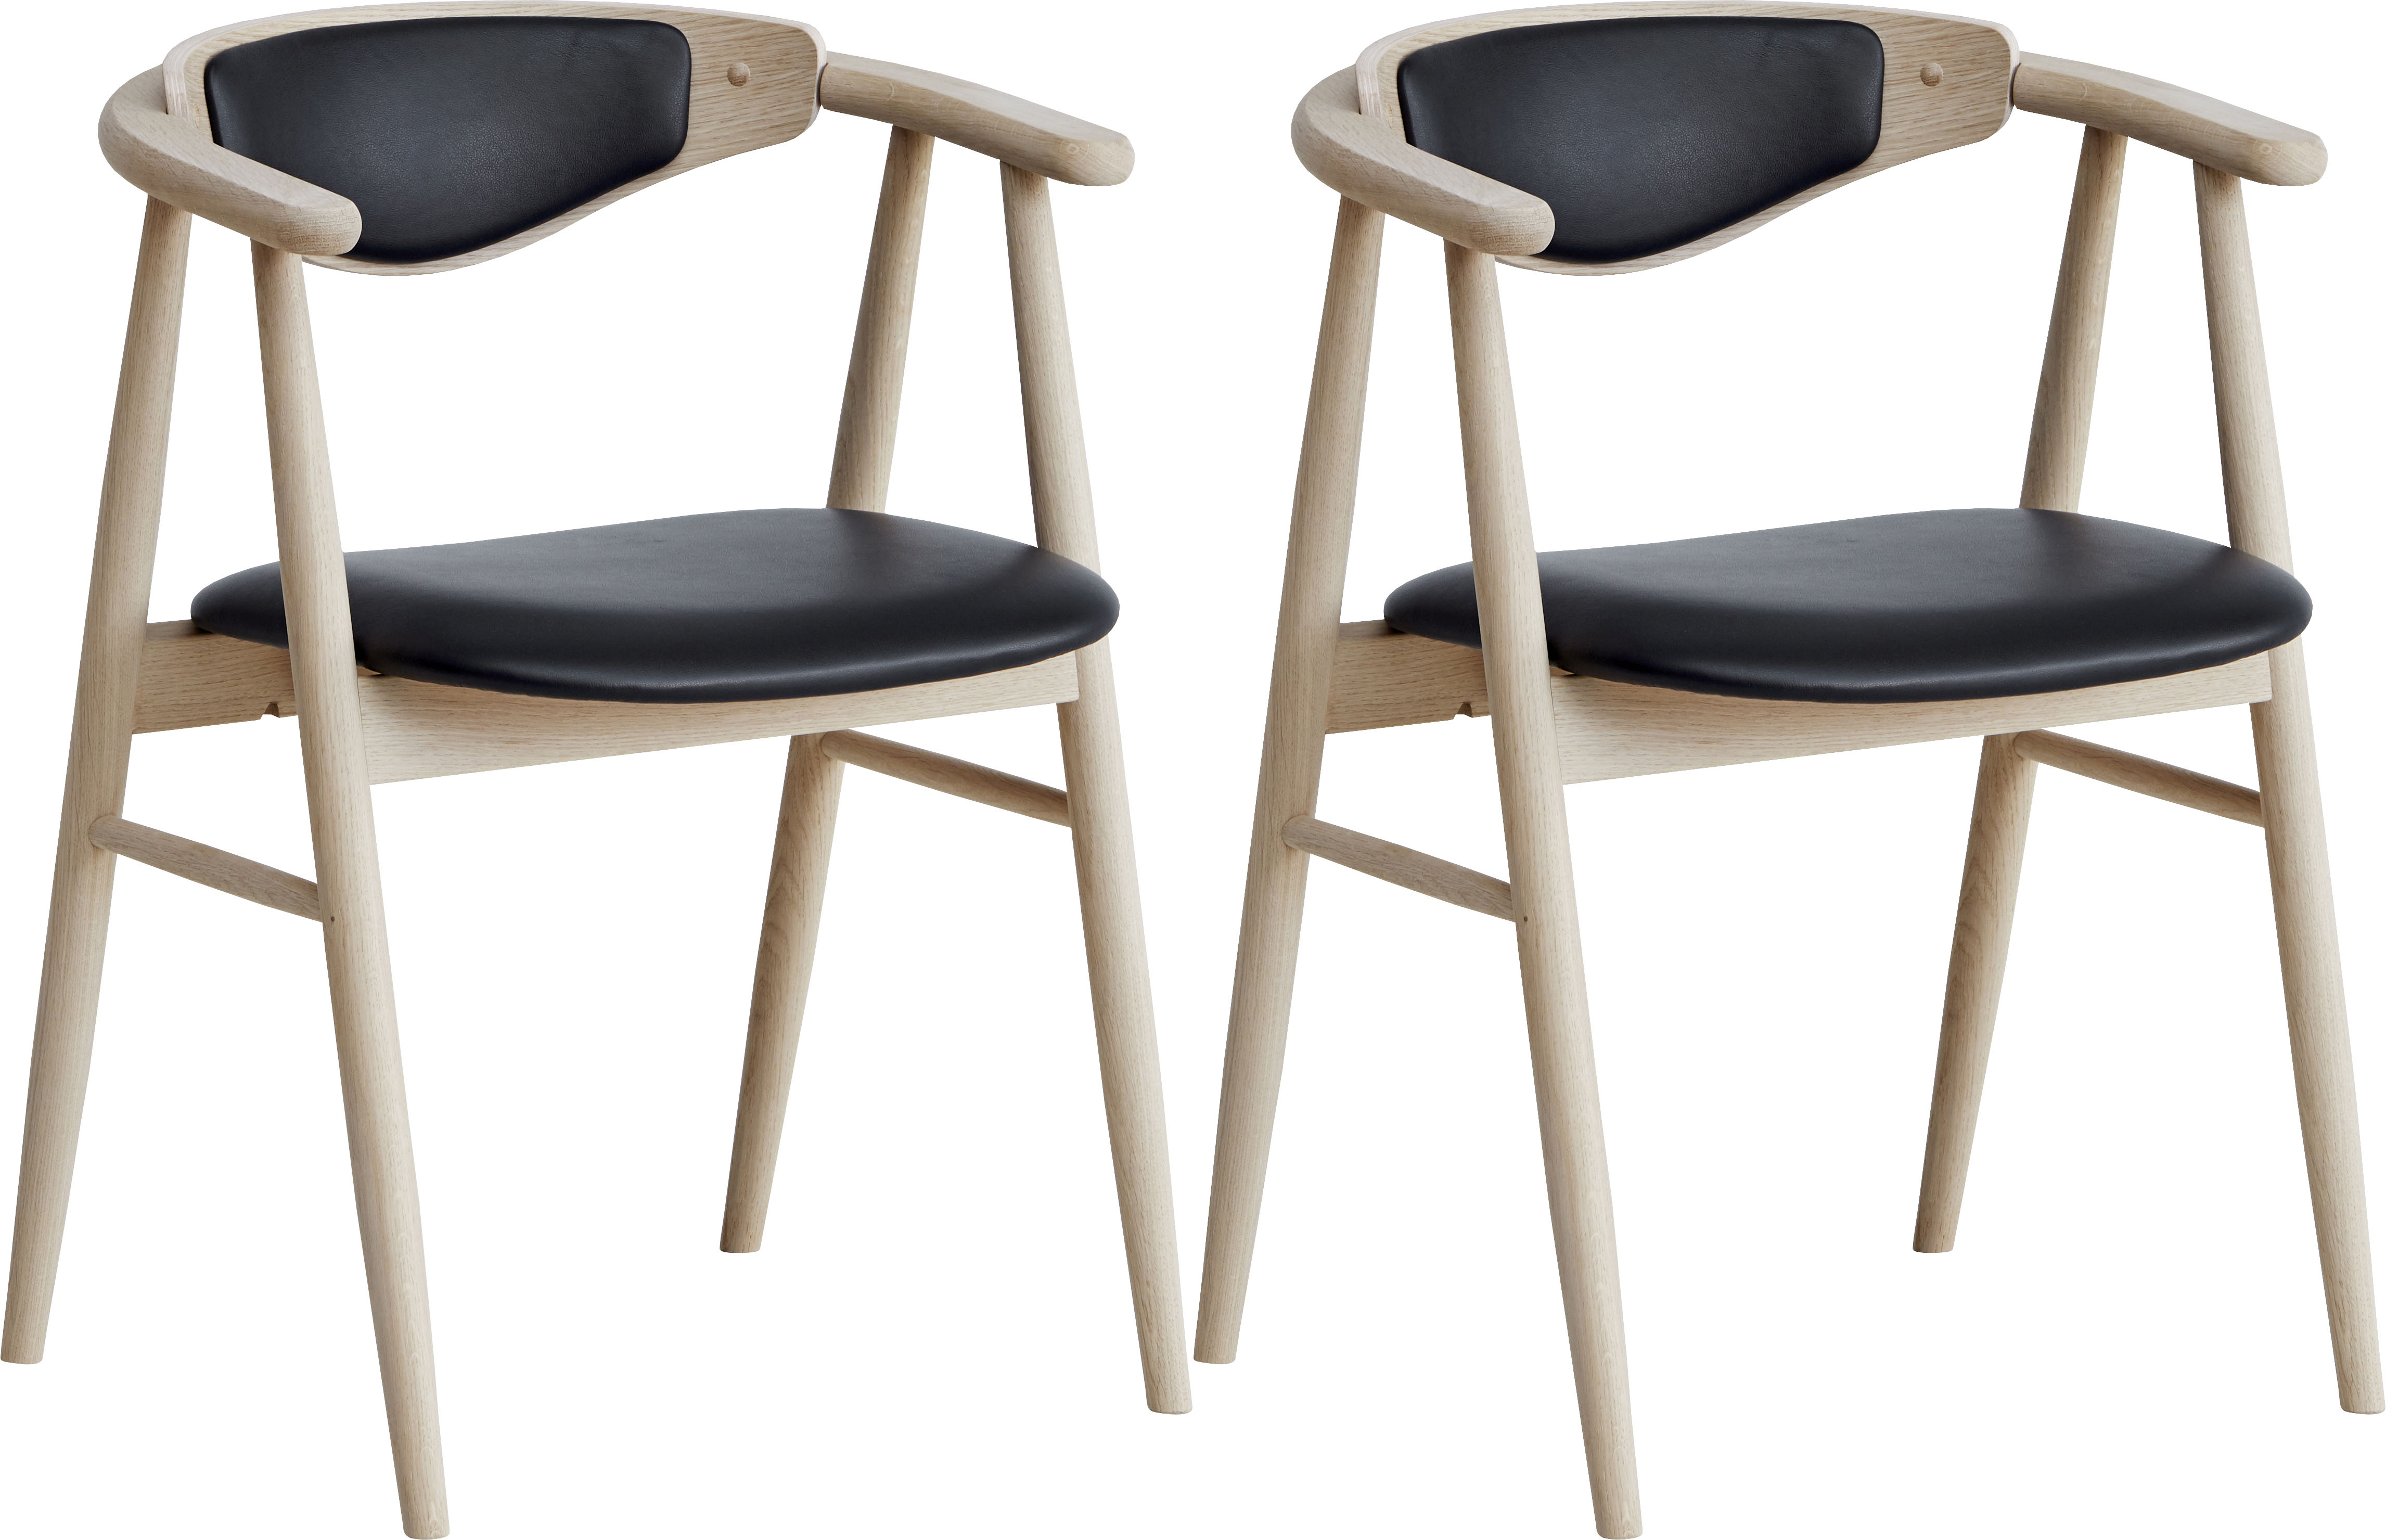 hammel Holzstuhl Findahl beige Holzstühle Stühle Sitzbänke